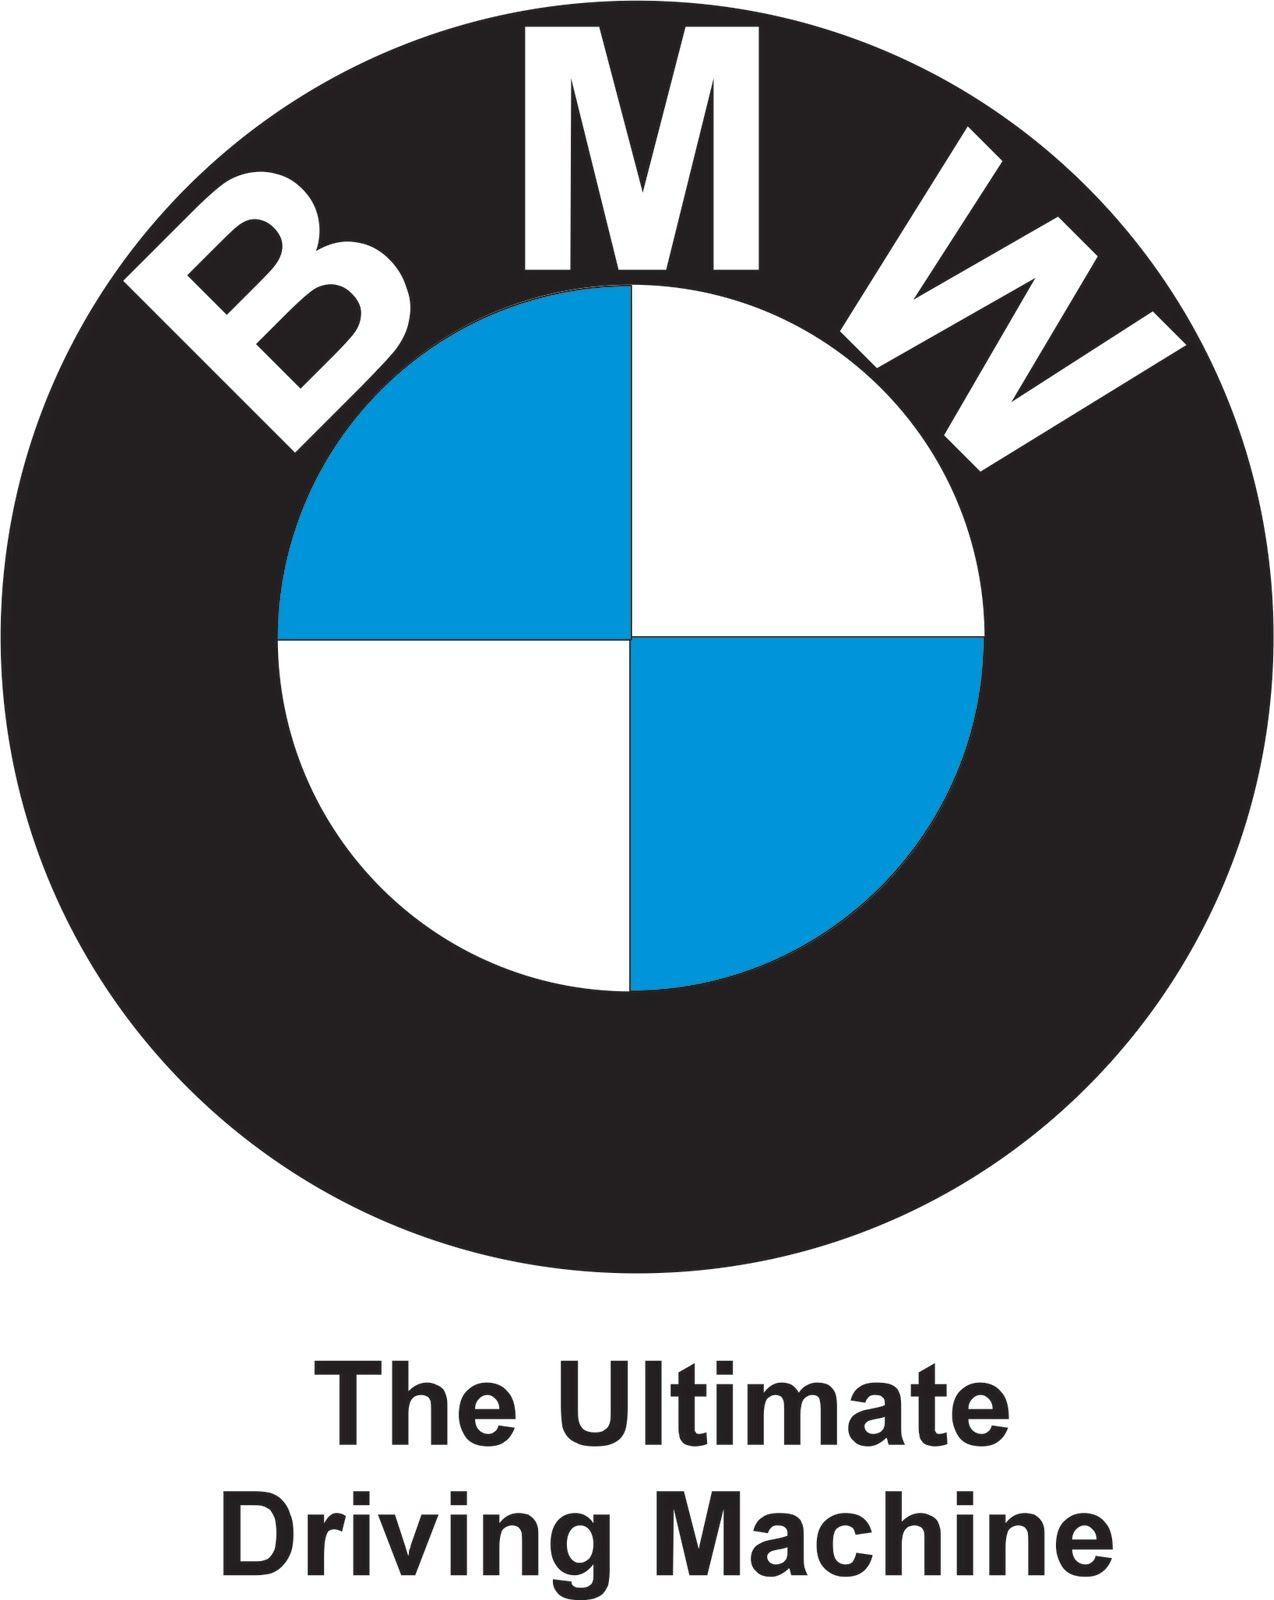 I wholeheartedly agree. Bmw logo, Logos, Bmw